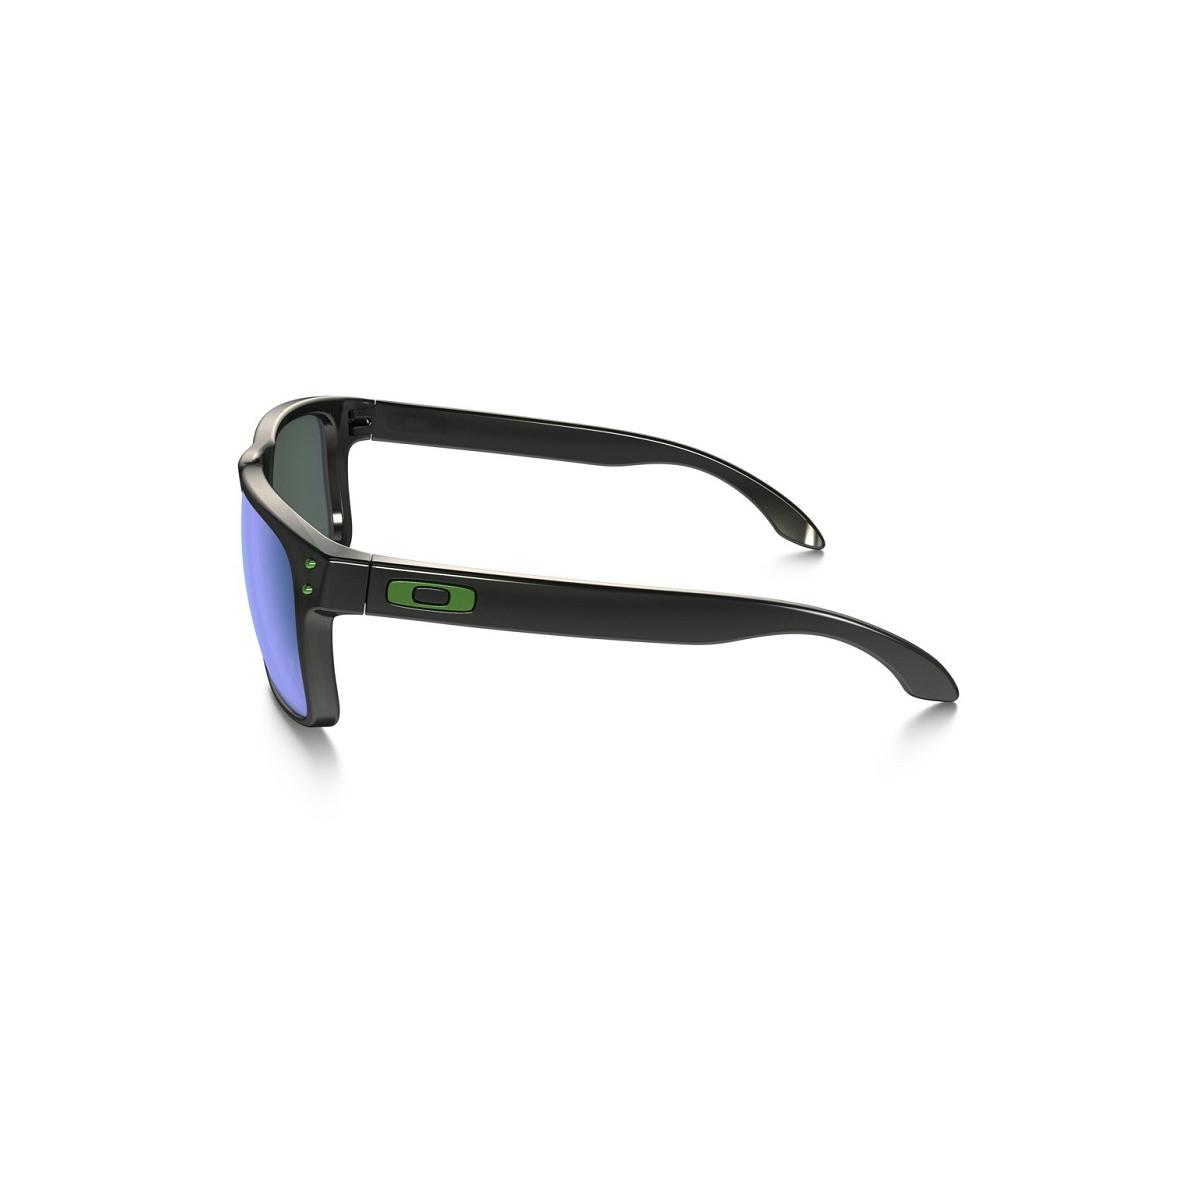 7dccf82f7c891 ... Óculos Oakley Holbrook Polished Black  Lente Jade Iridium Polarizado ...